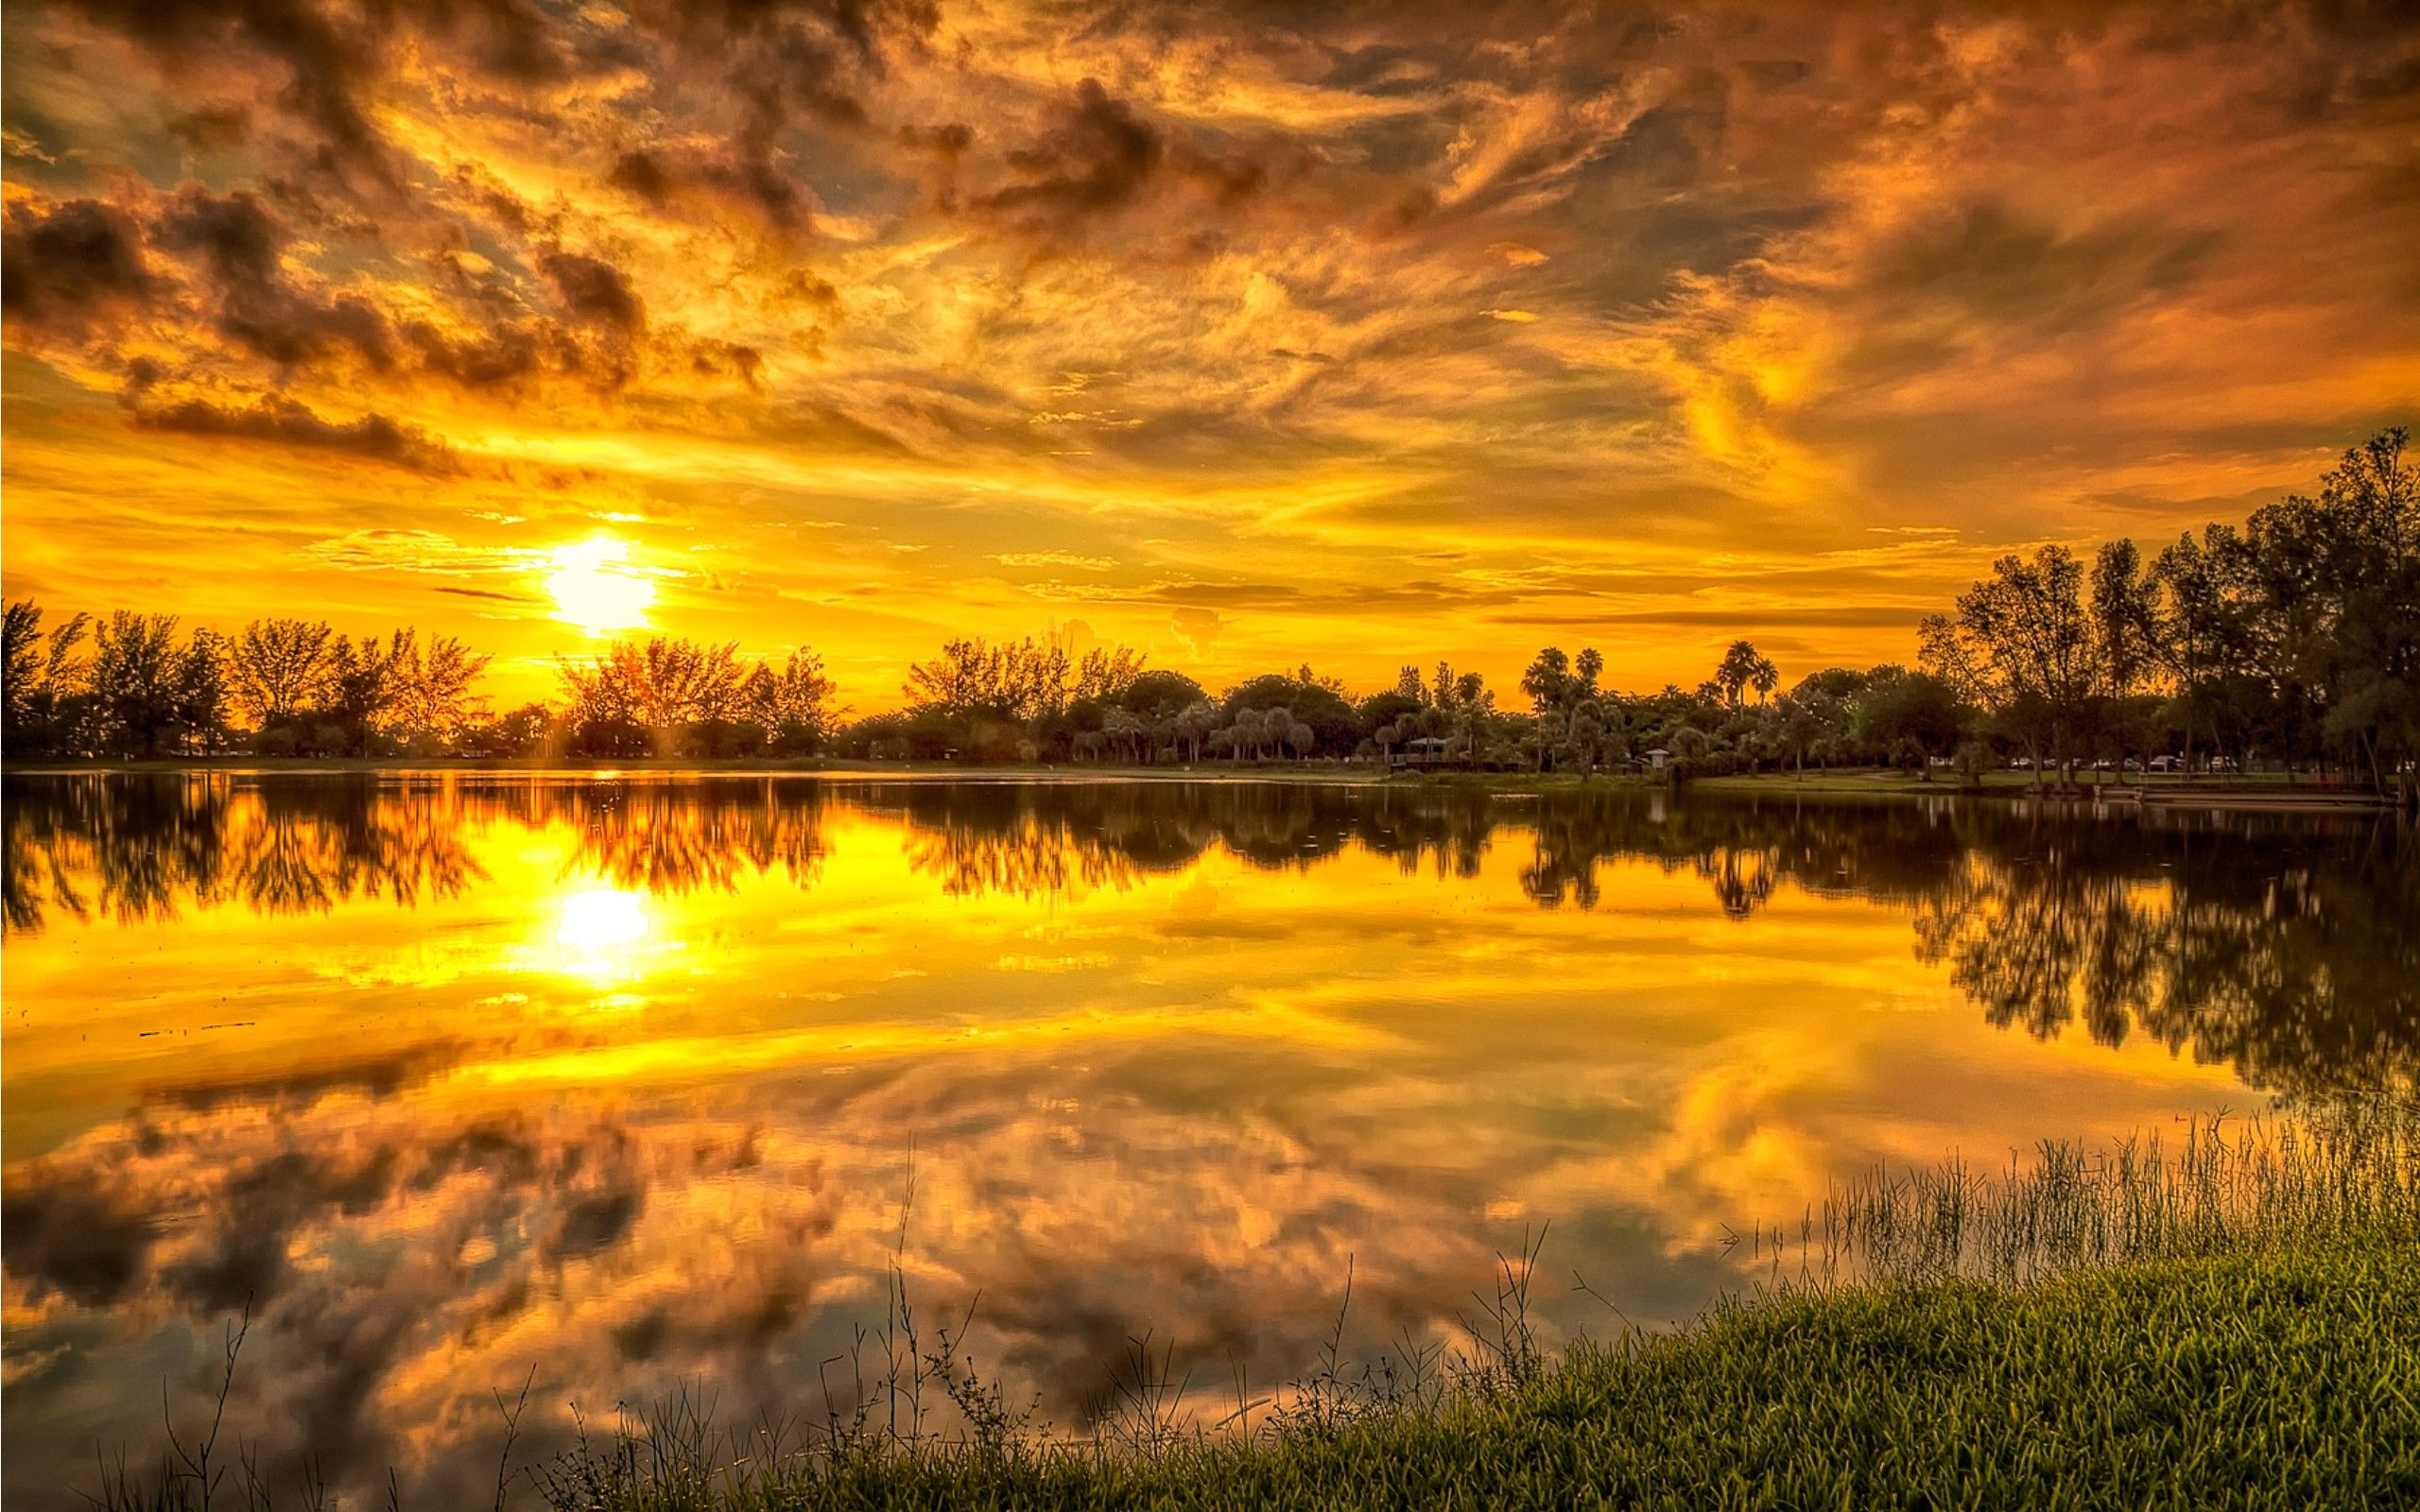 Sunrise Landscapes HD Lock Screen Wallpaper amazing